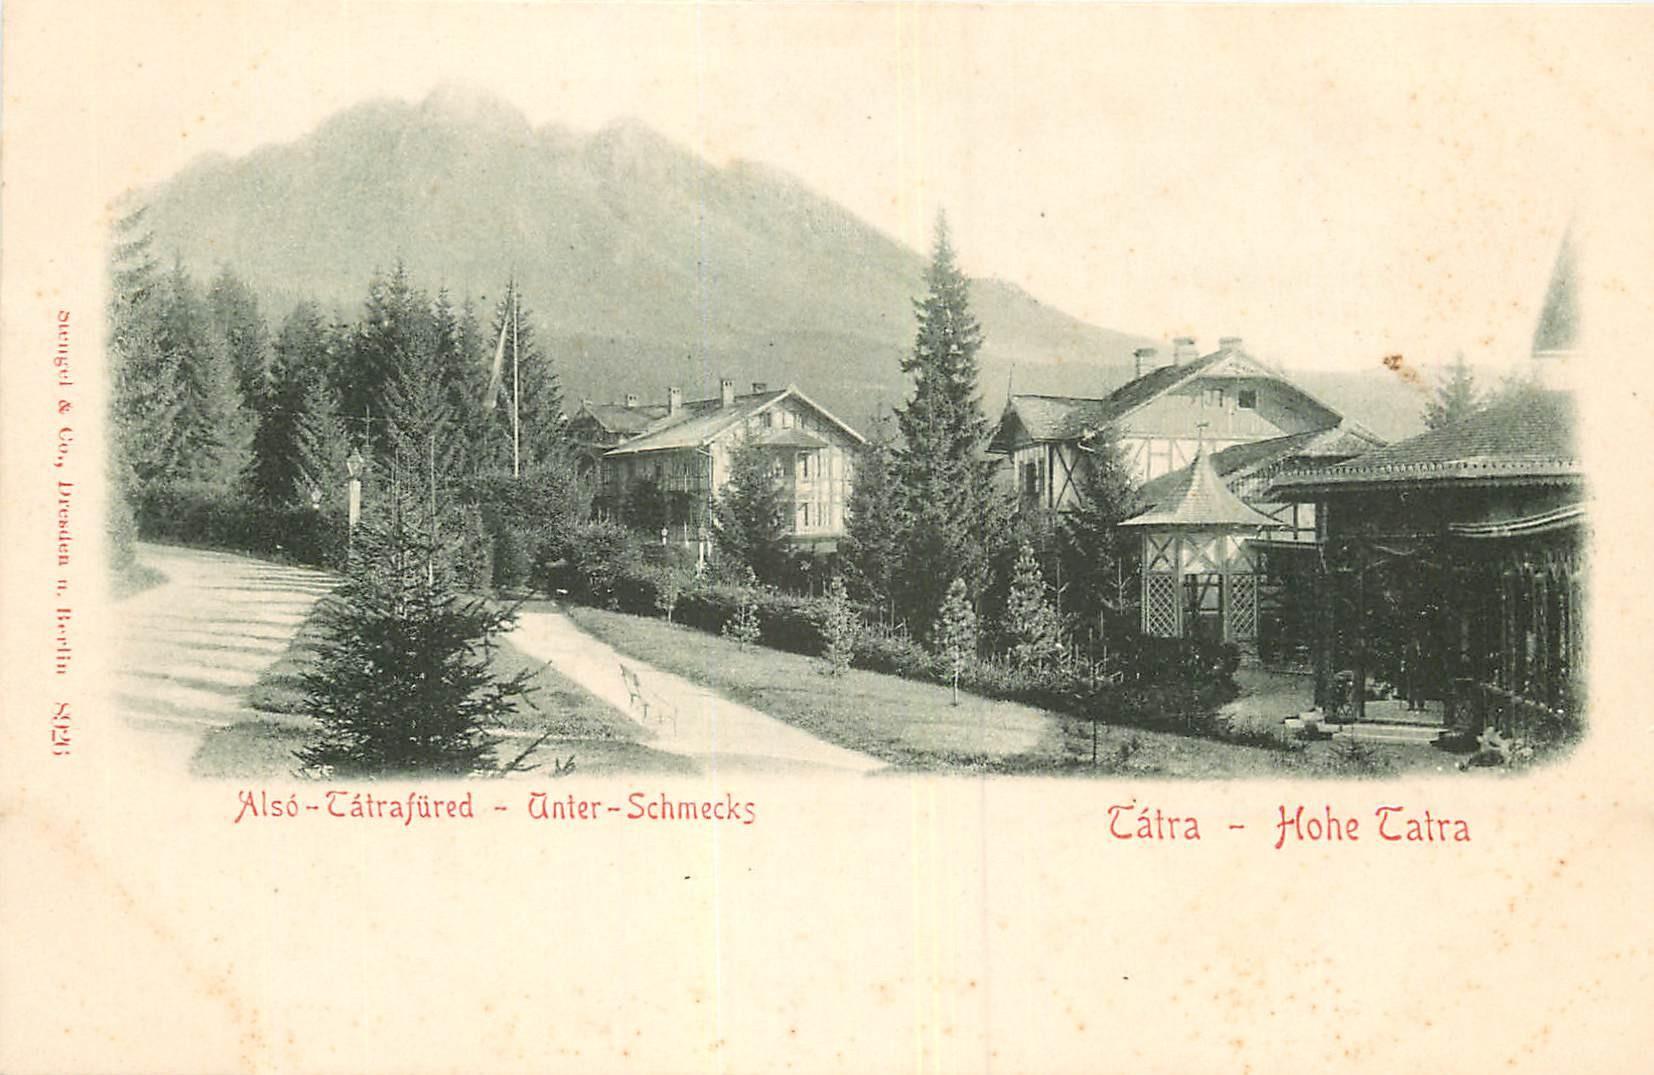 WW SLOVAQUIE. Hohe Tatre vers 1900